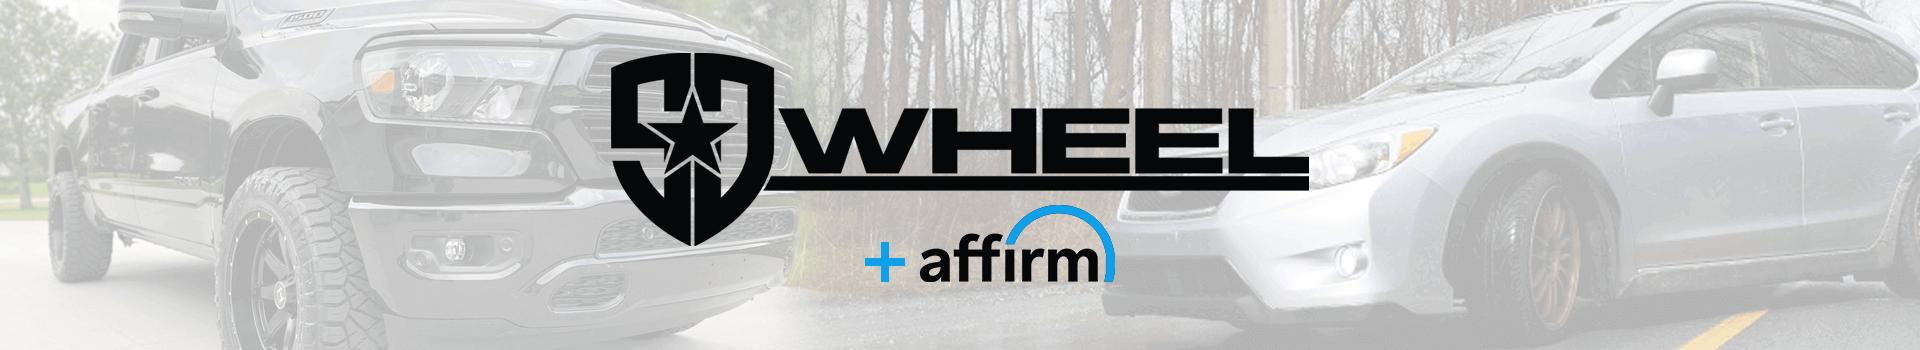 SD Wheel offers financing through Affirm